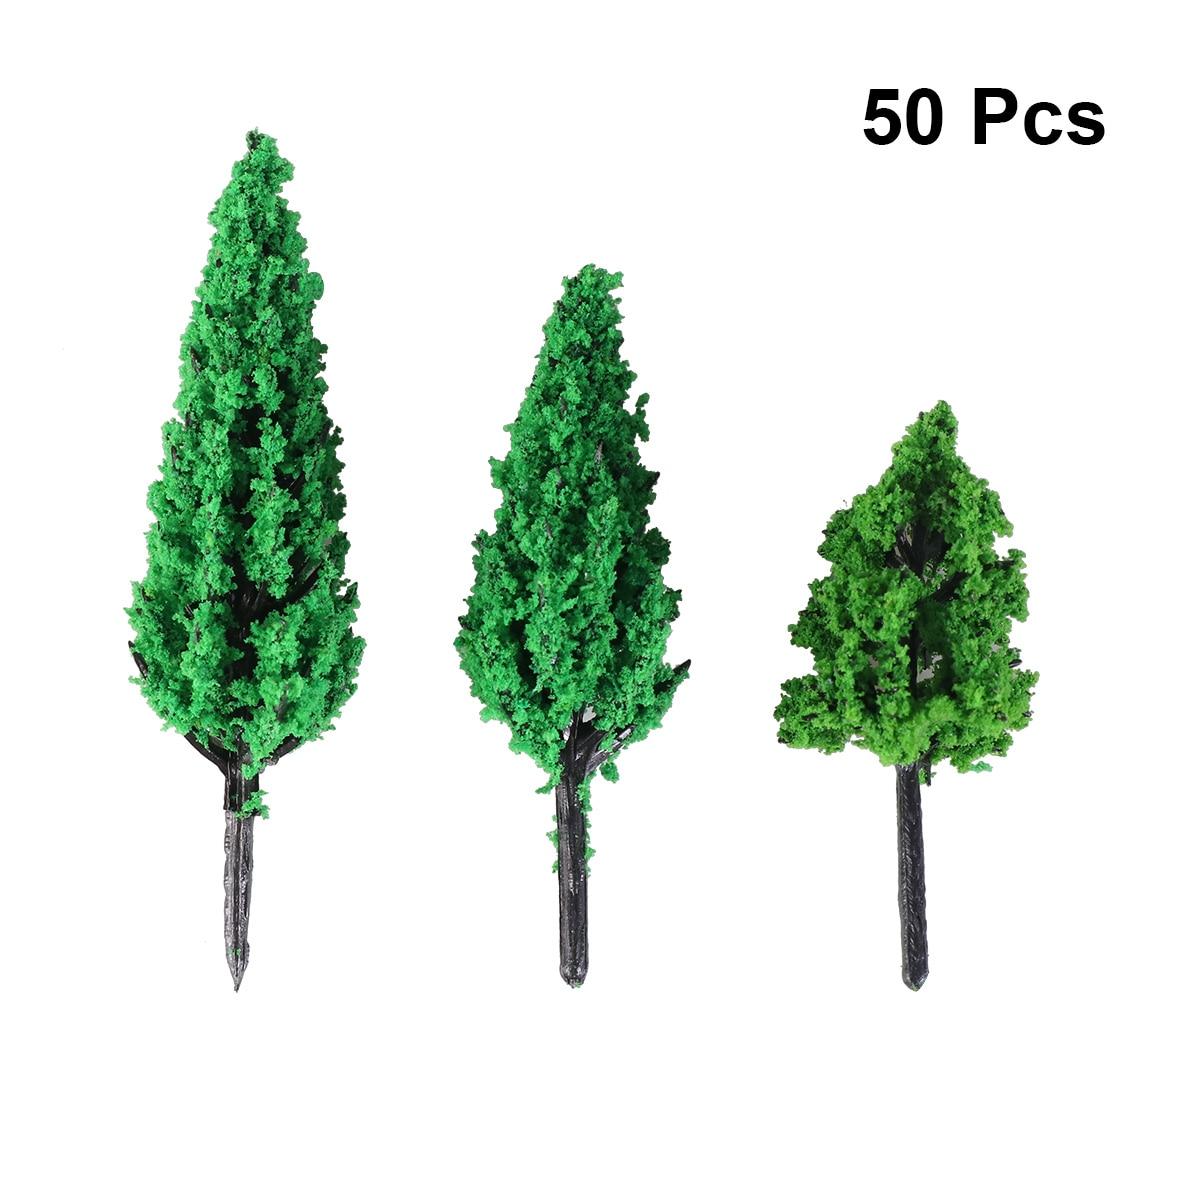 50pcs Model Trees Park Pine Poplar Forest Pagoda Miniature Diorama Micro Layout Scenery Decoration Mininatures